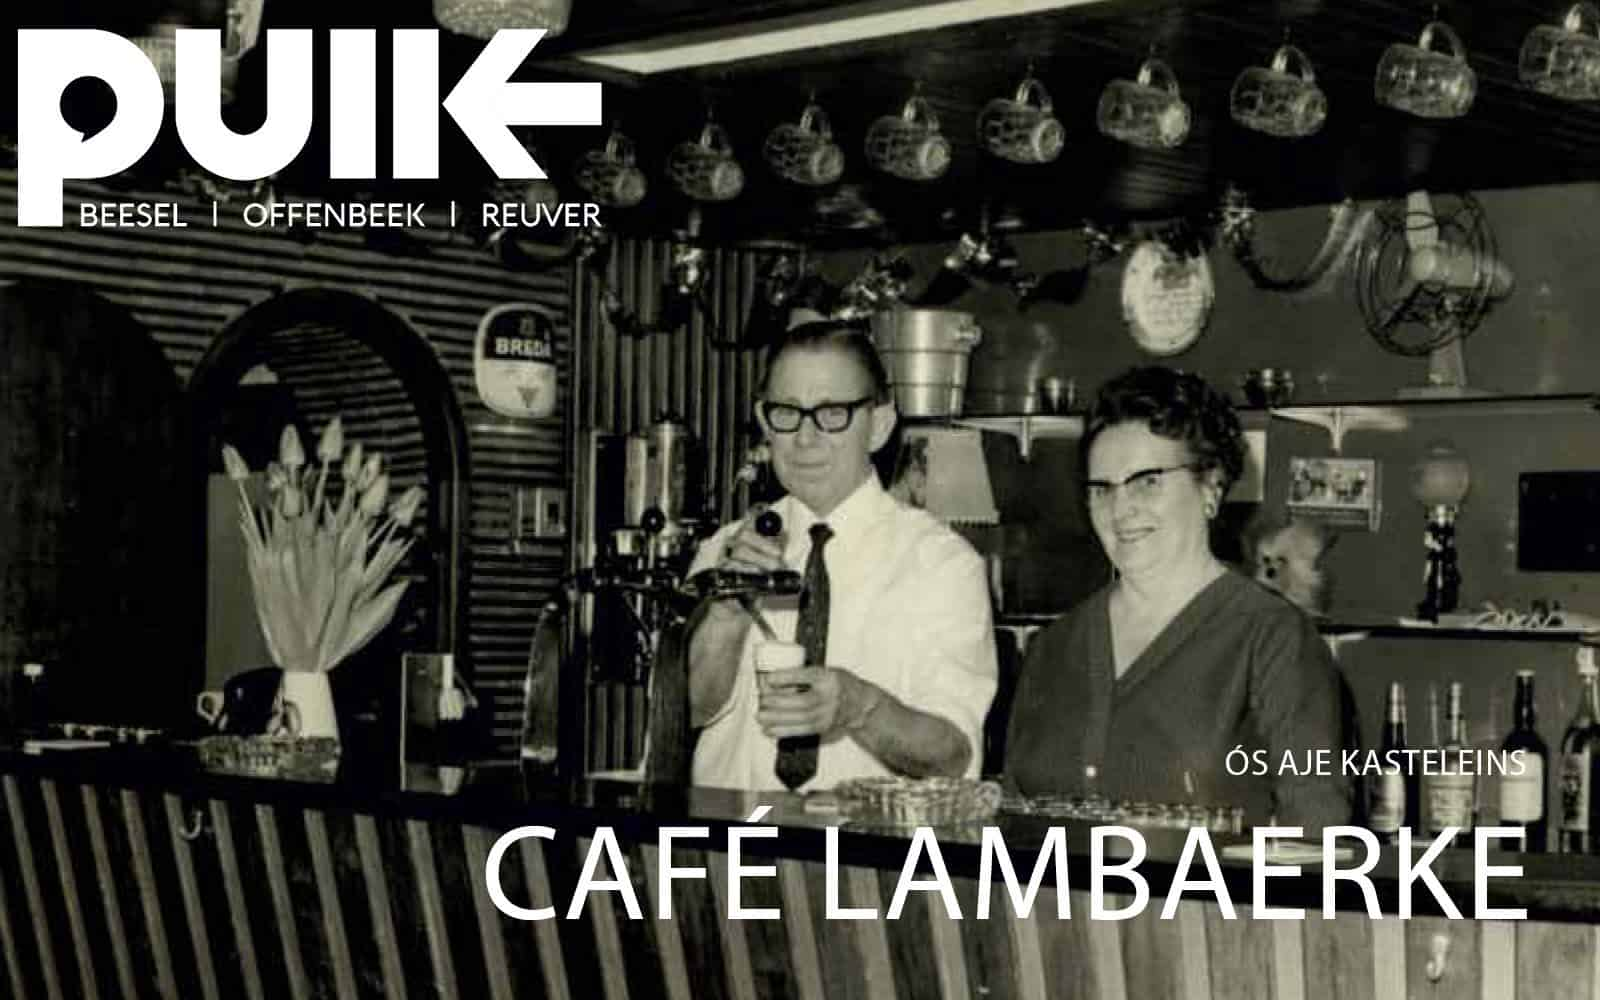 14 november 2018 - Cafe Lambaerke